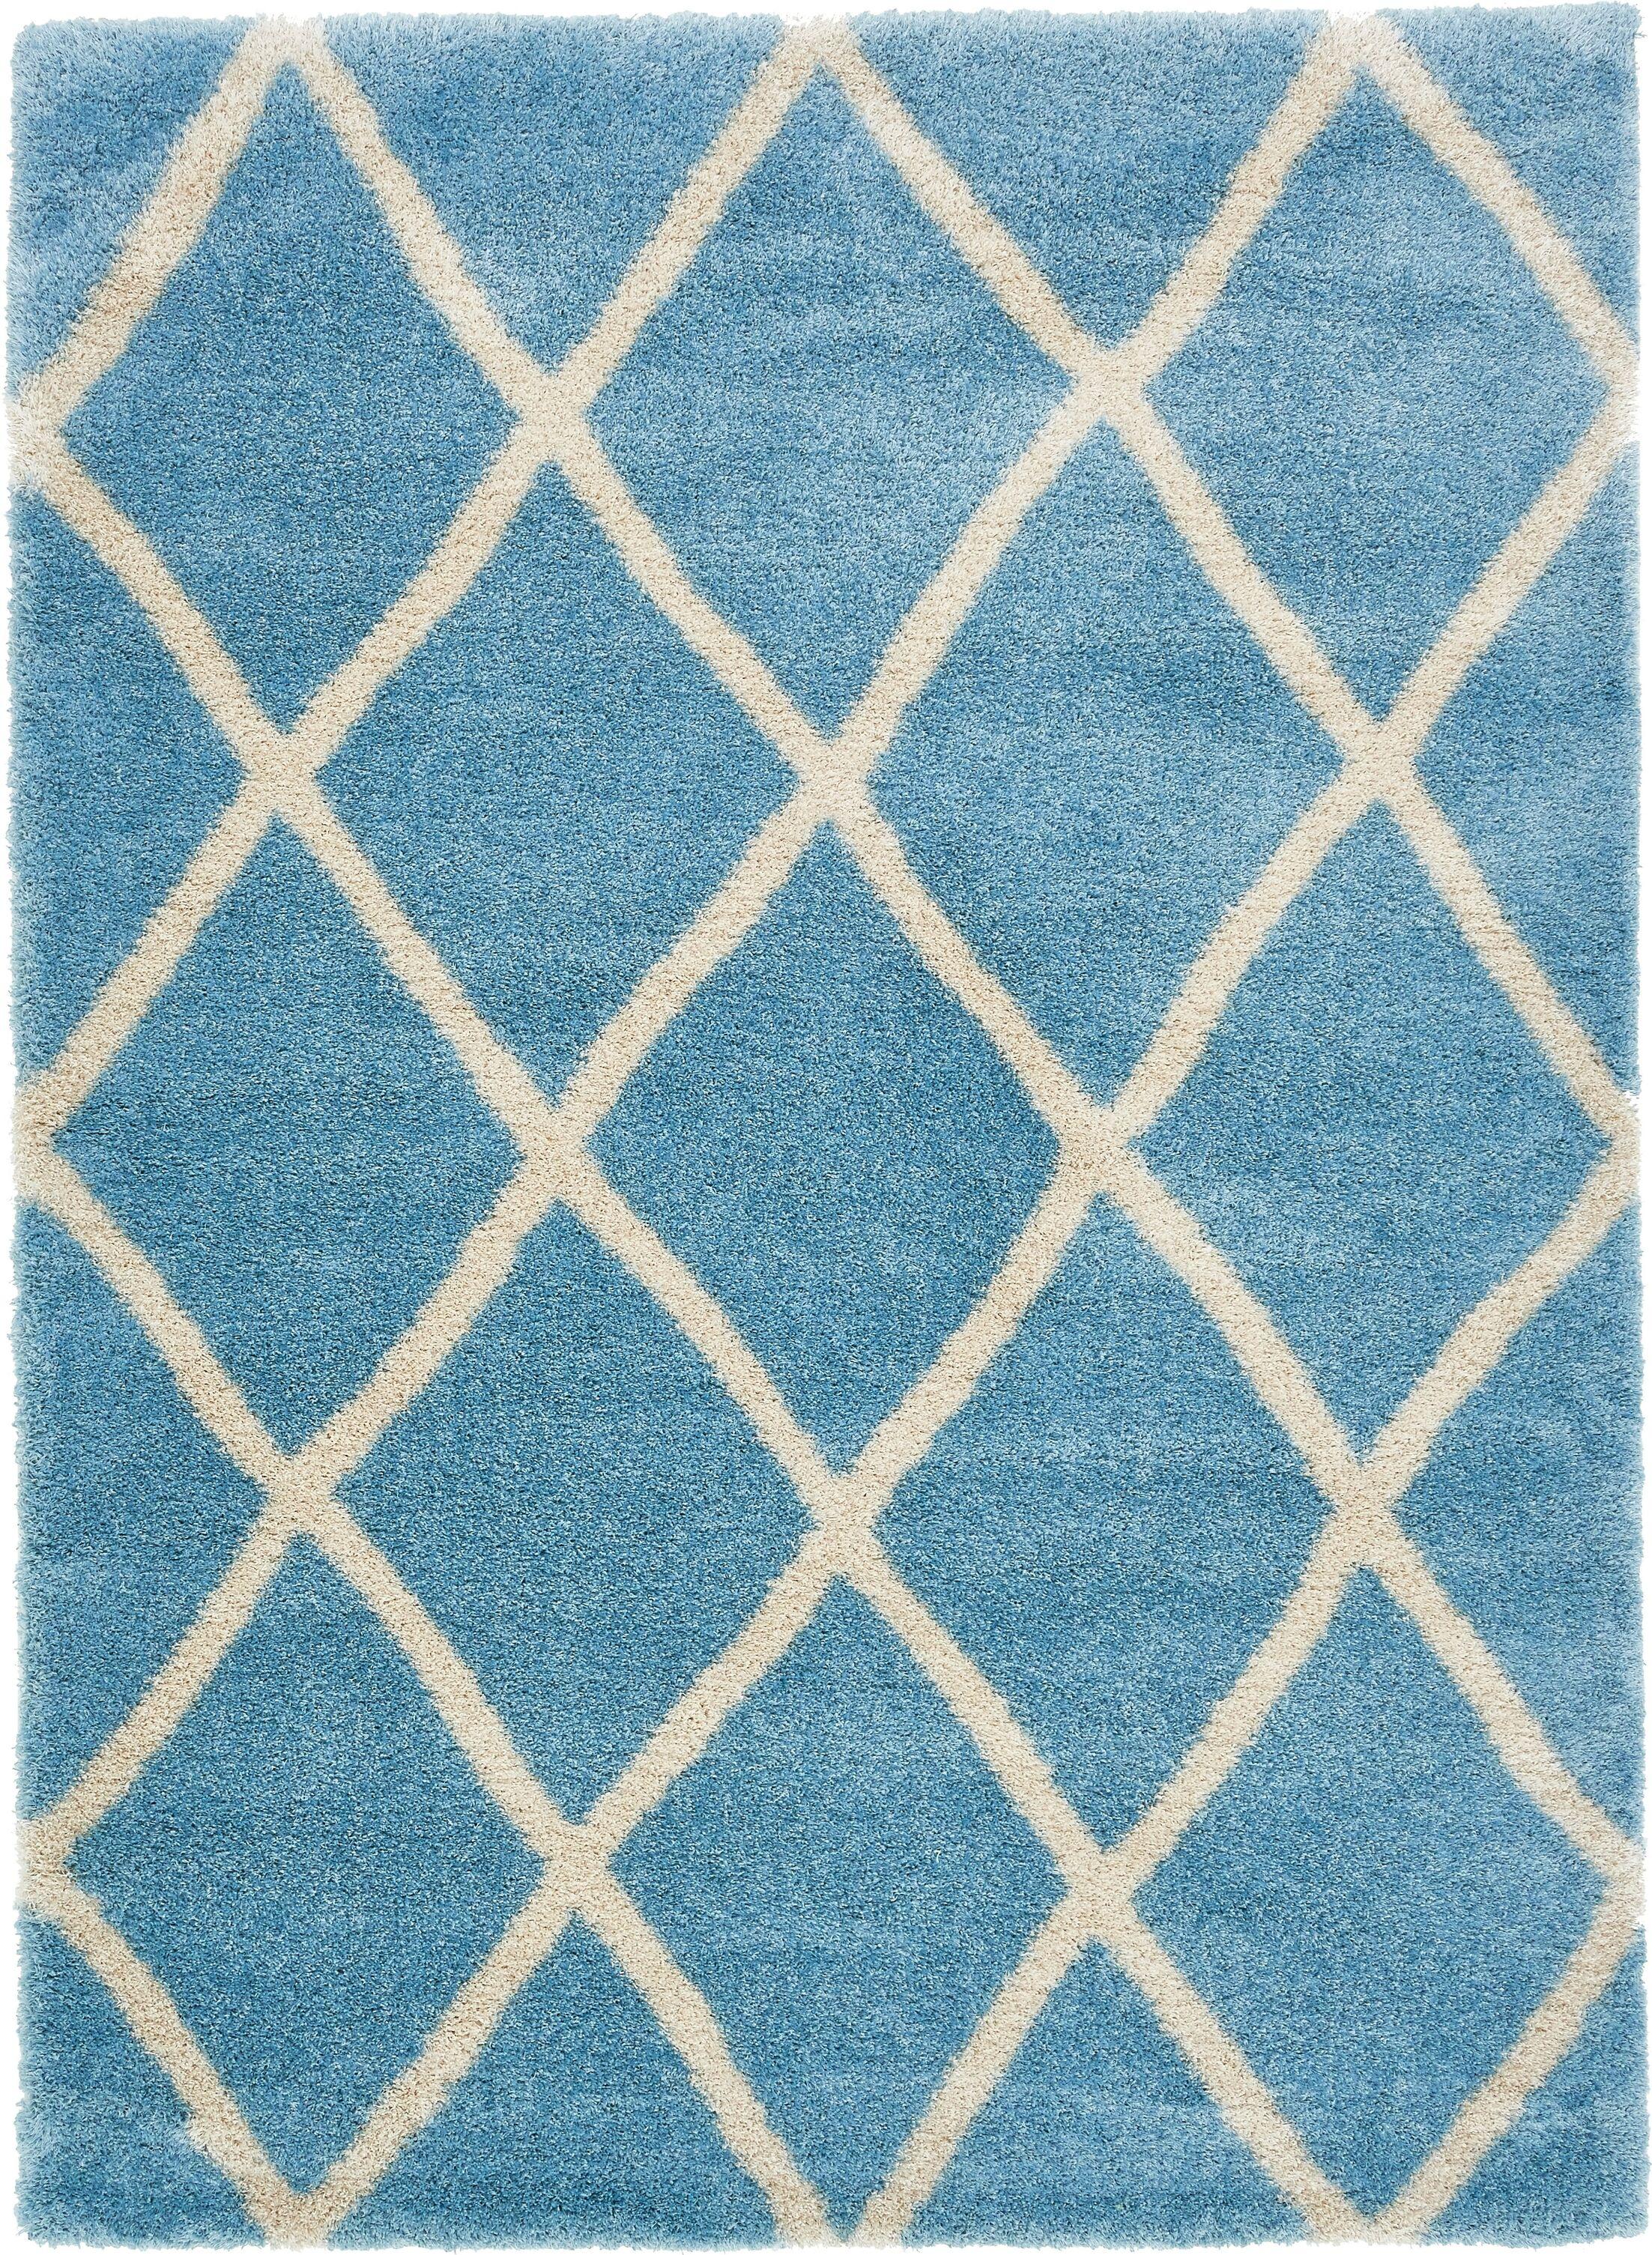 Southampton Light Blue Area Rug Rug Size: Rectangle 8' x 11'2